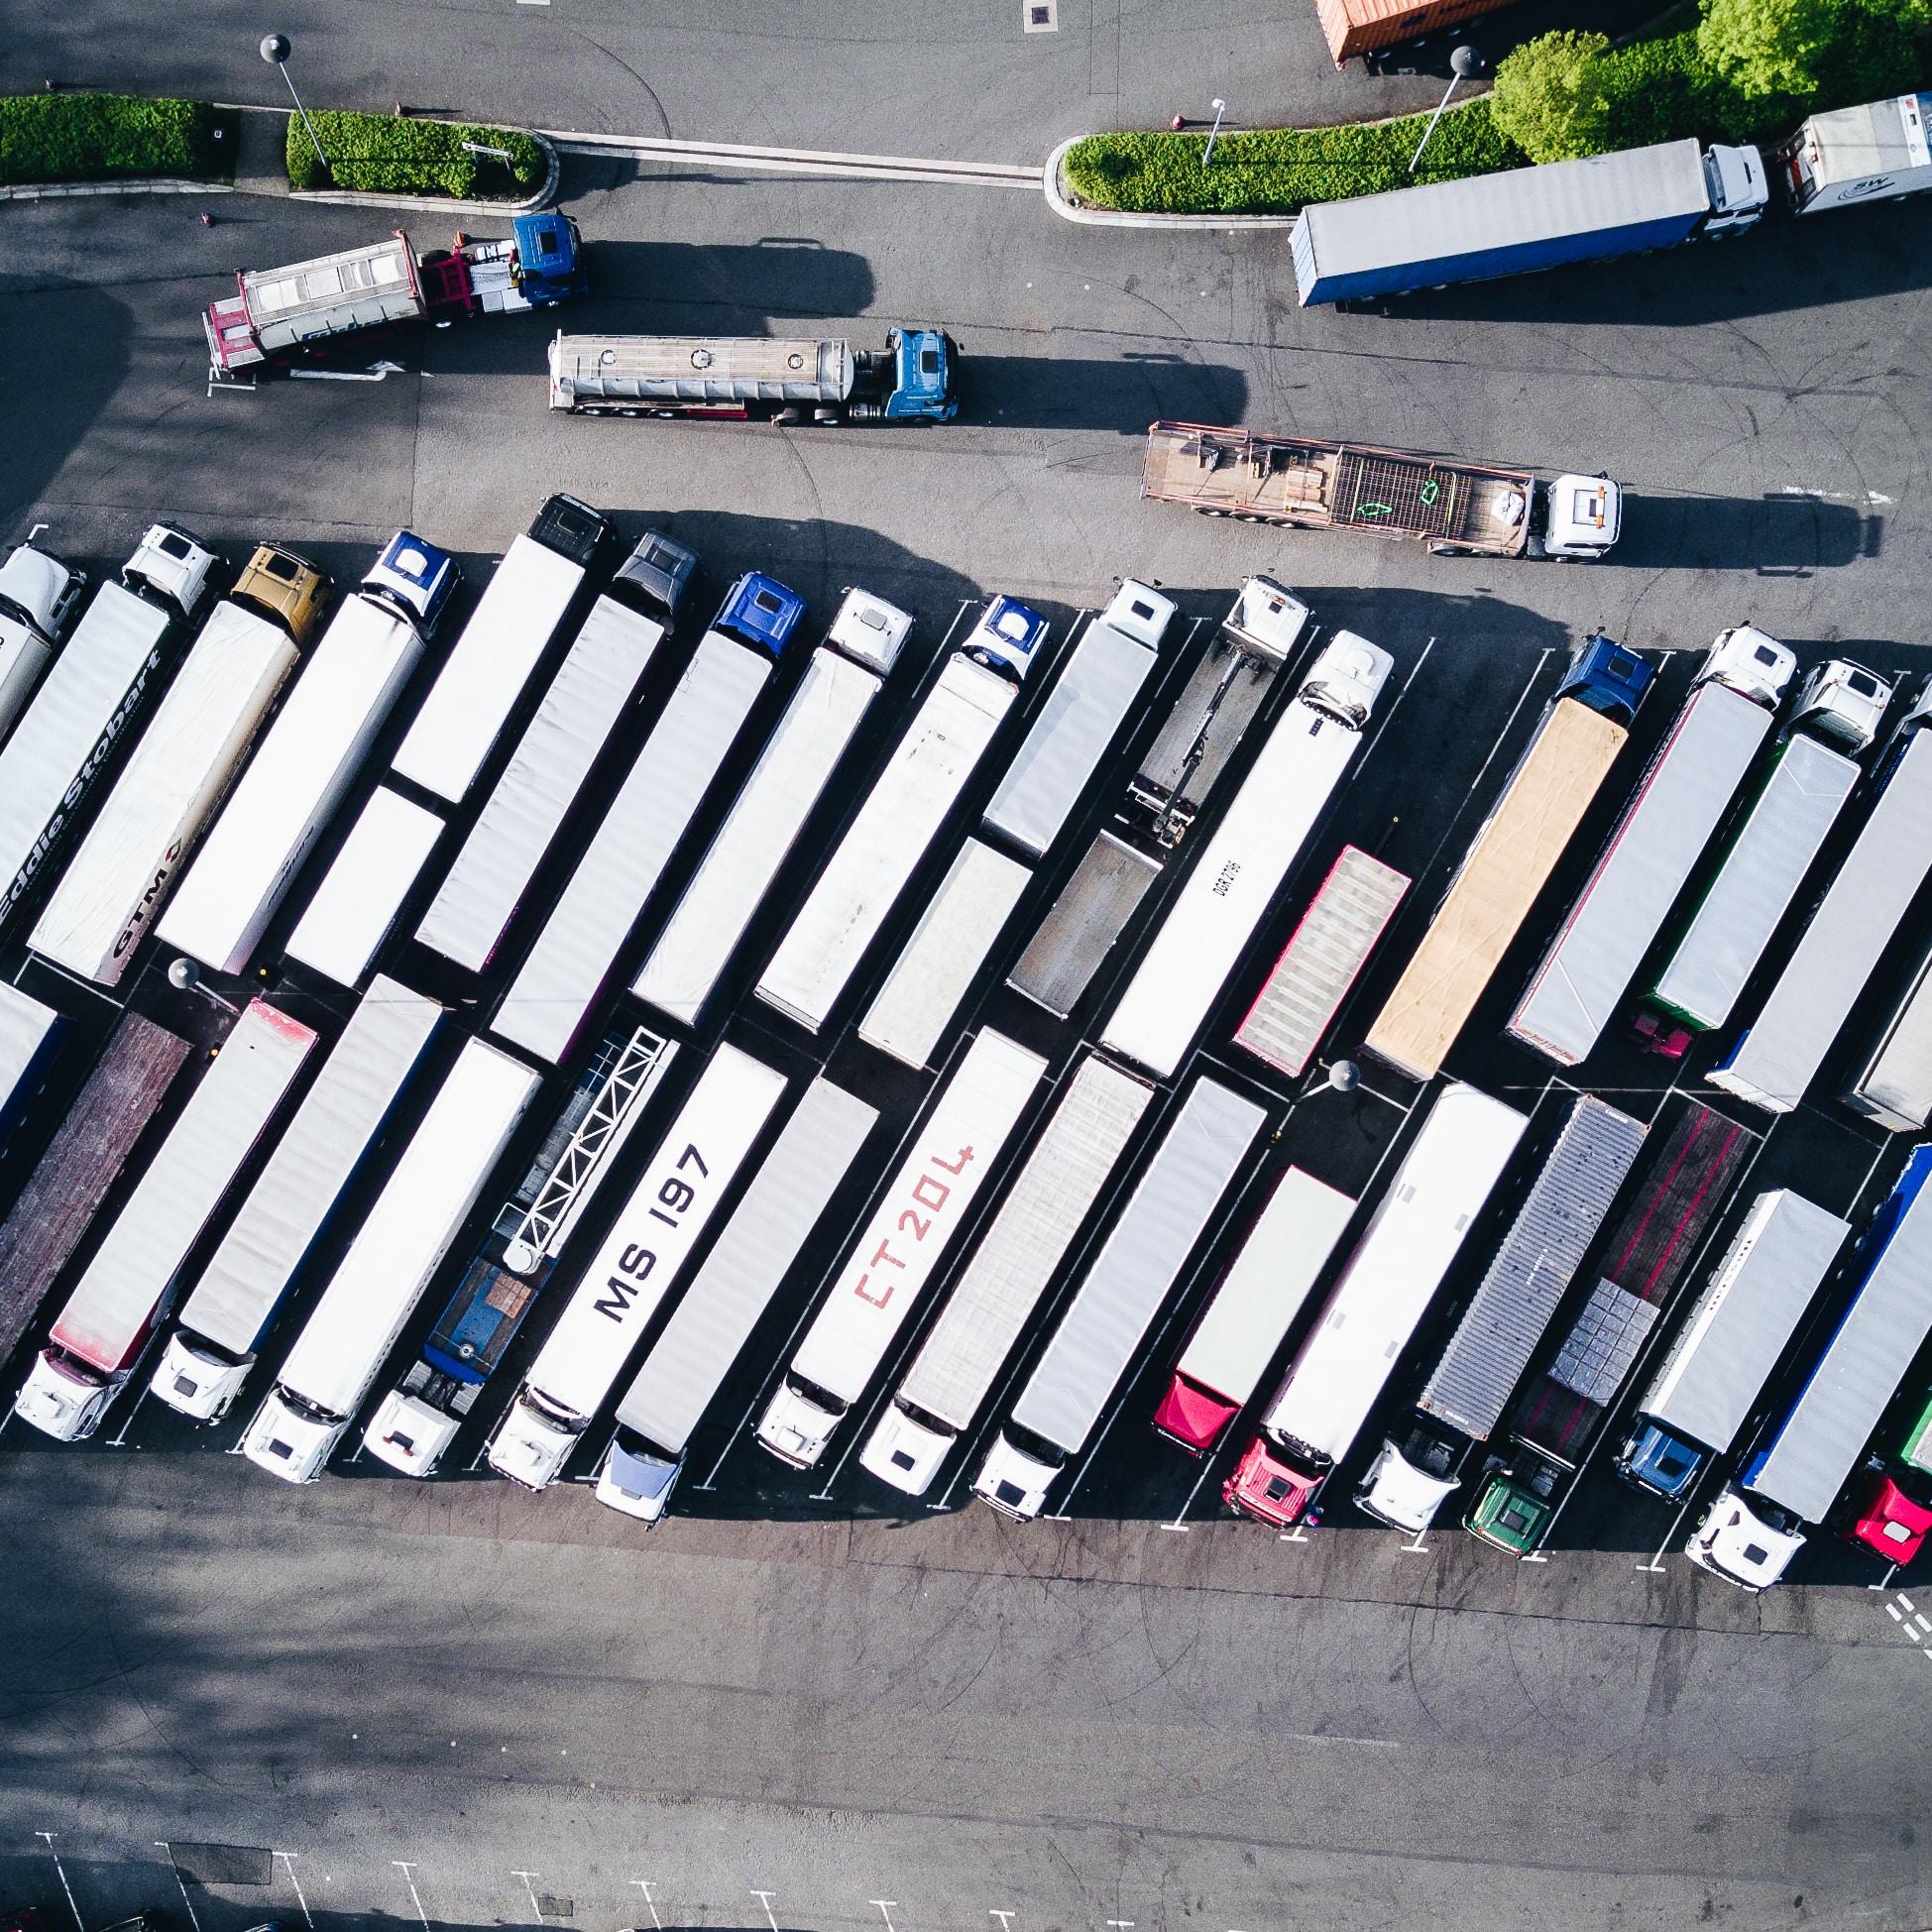 20191202 - trucks